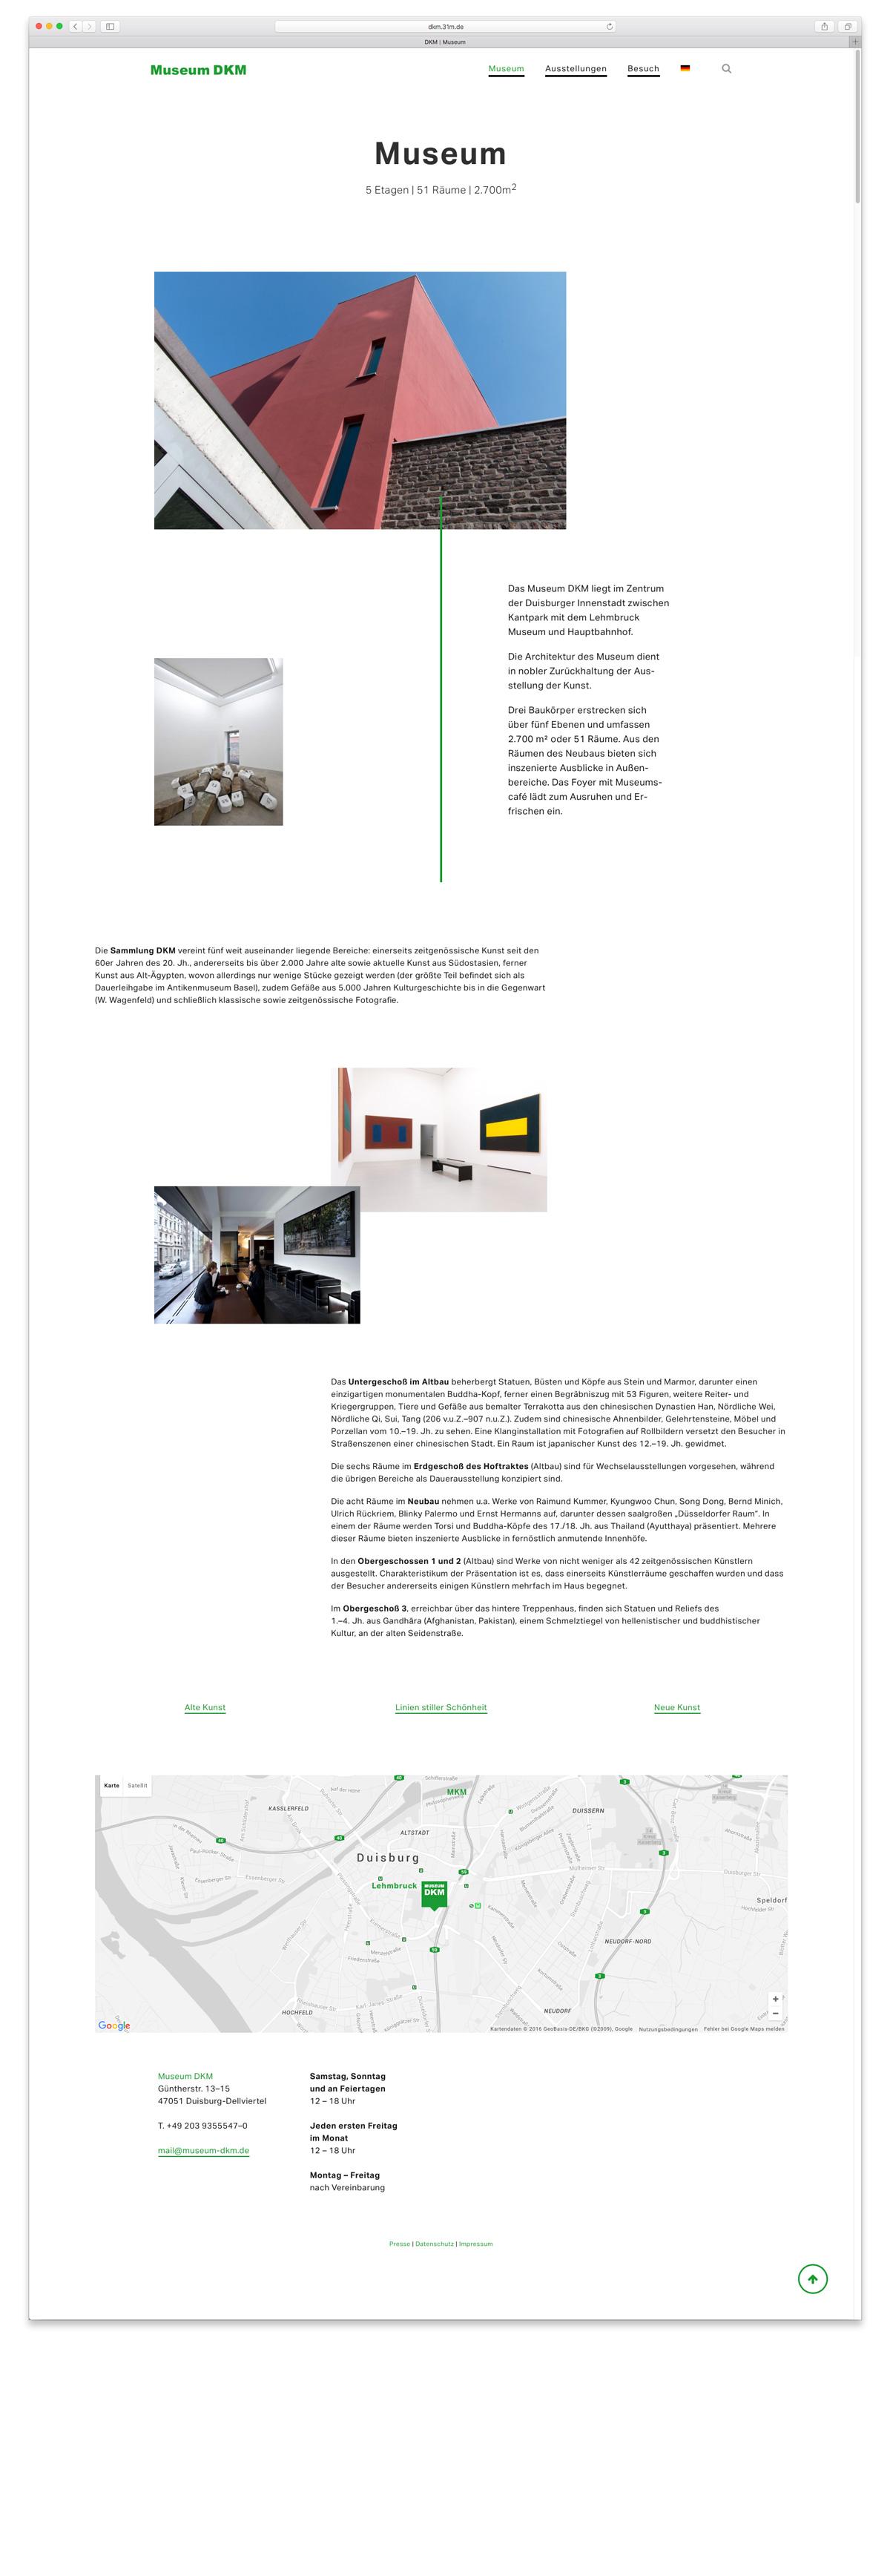 MUSEUM-DKM-FULLPAGE-2